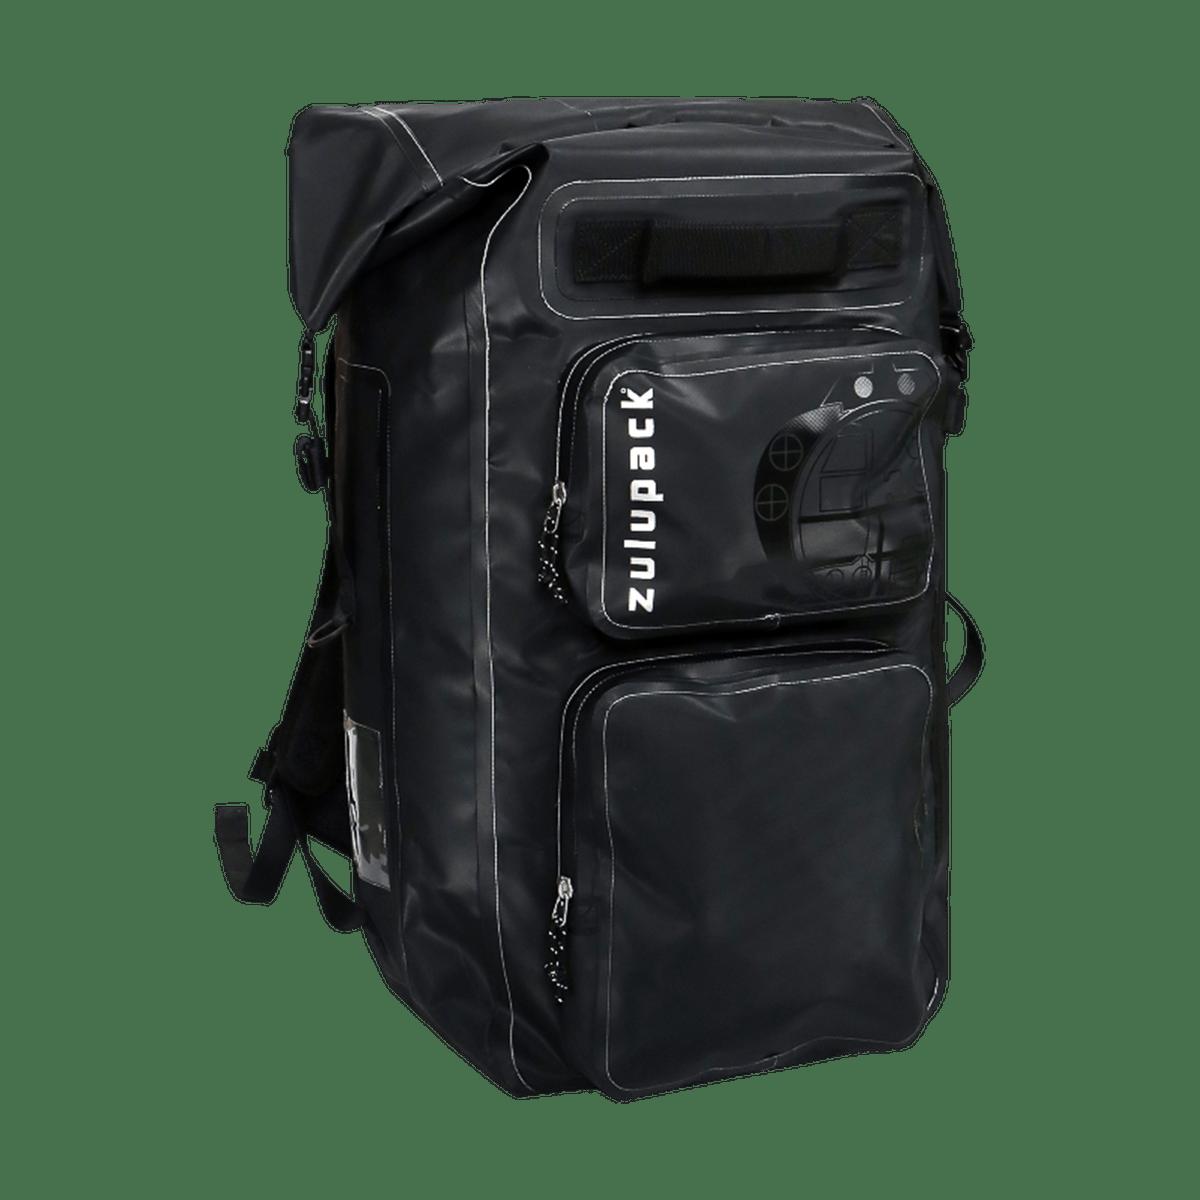 ZULUPACK – WA16939-7B – NOMAD 60 BLACK2